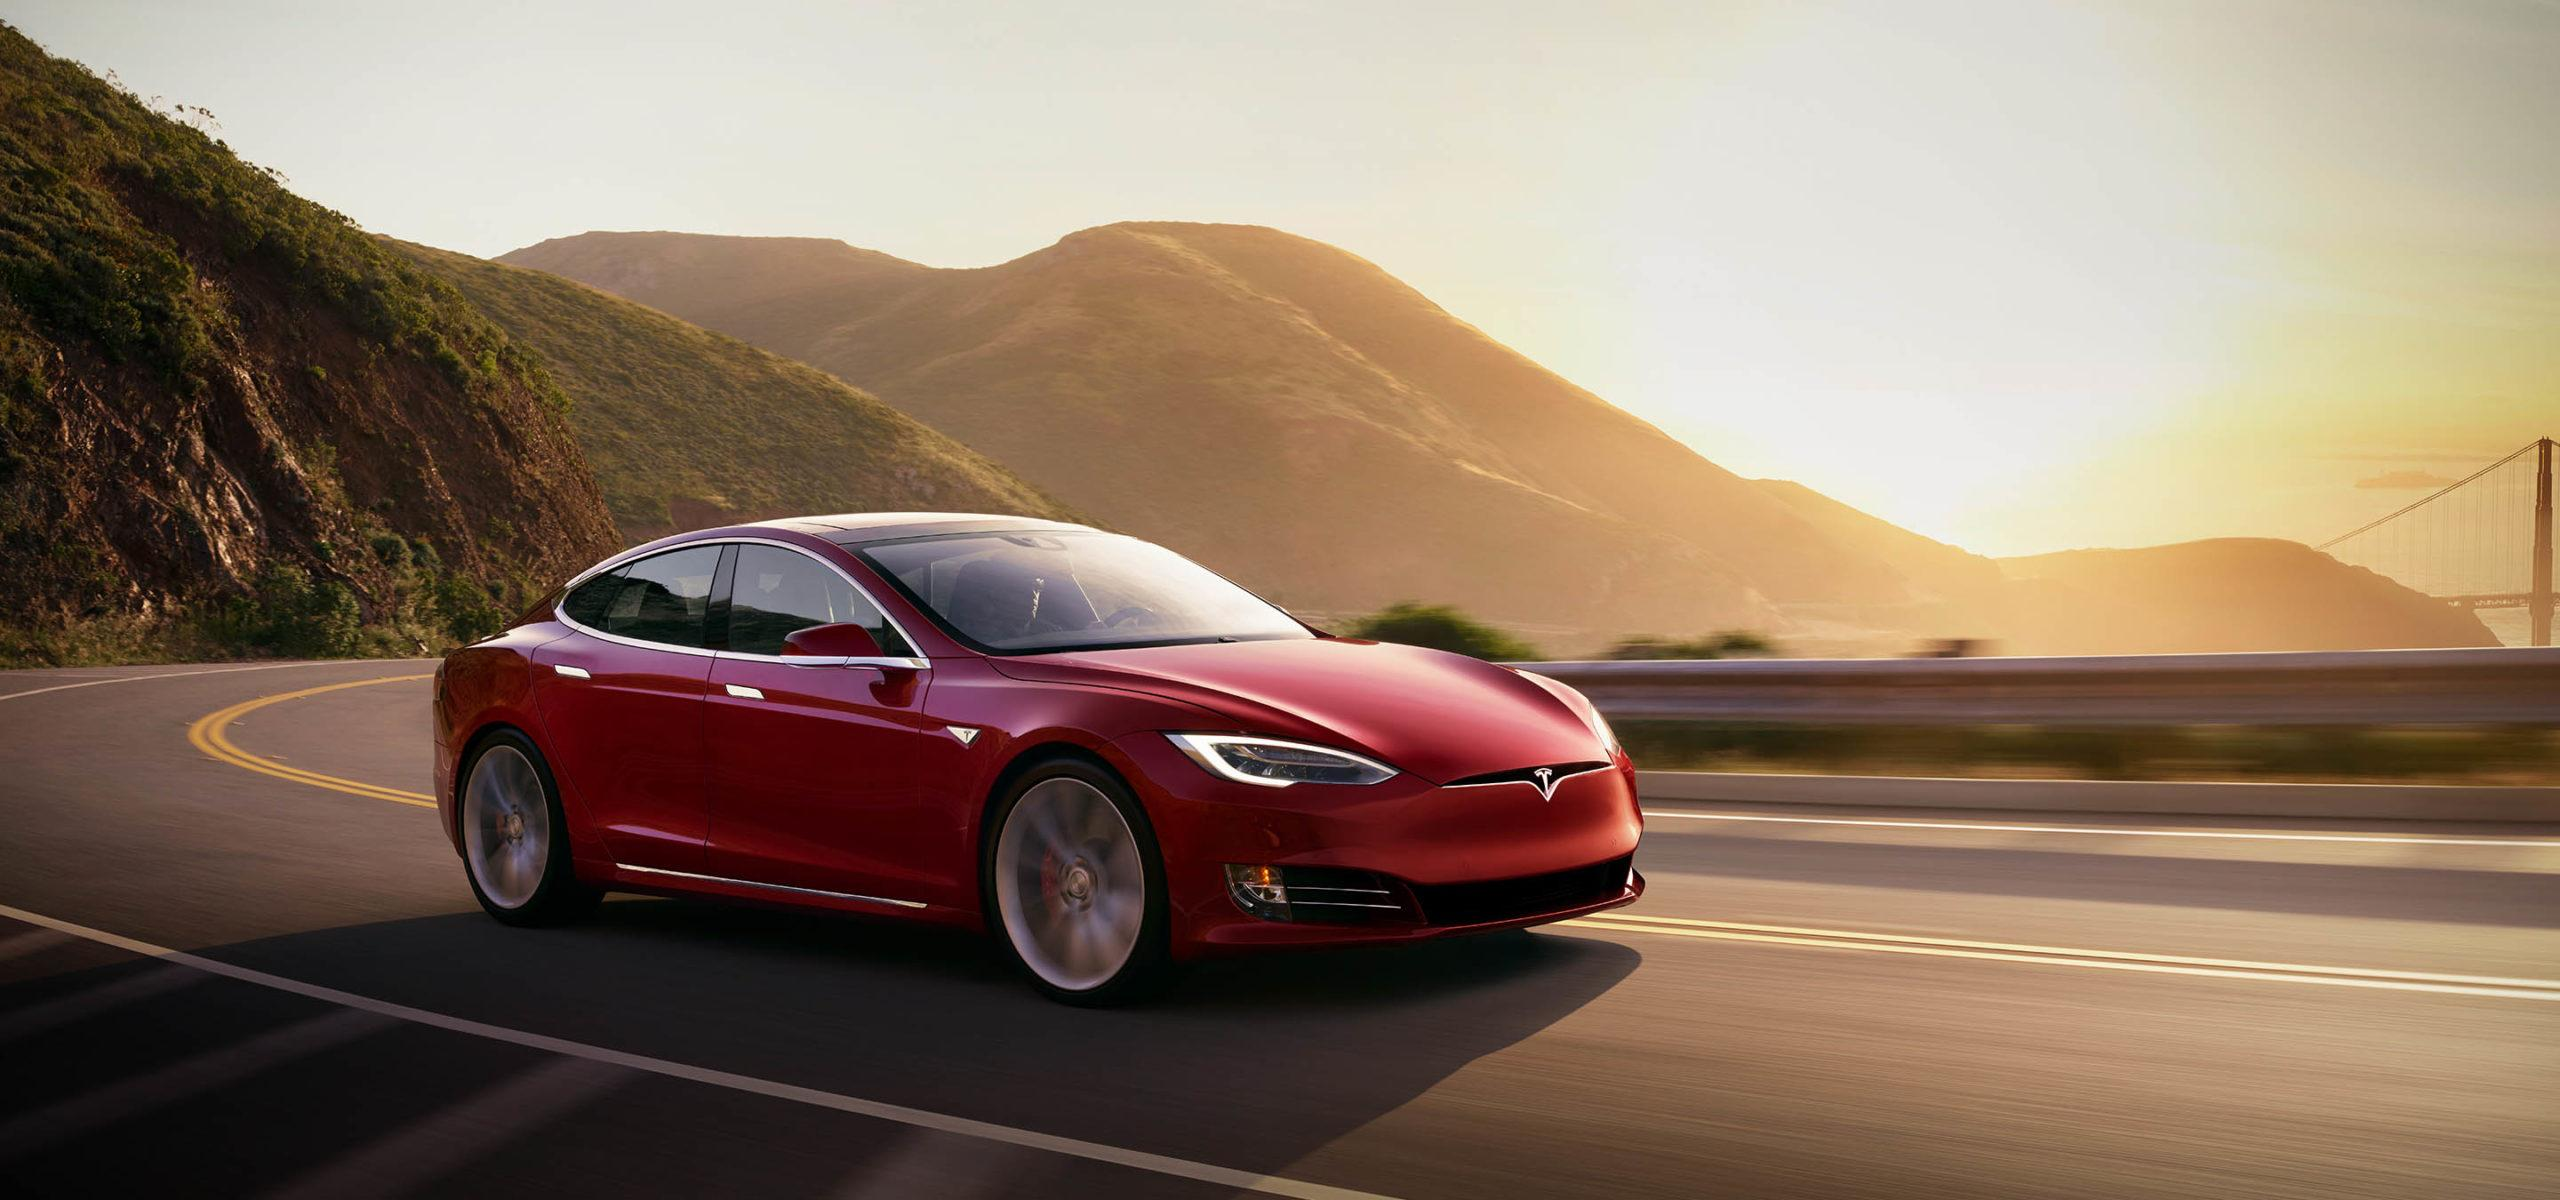 Tesla Model S Frontansicht